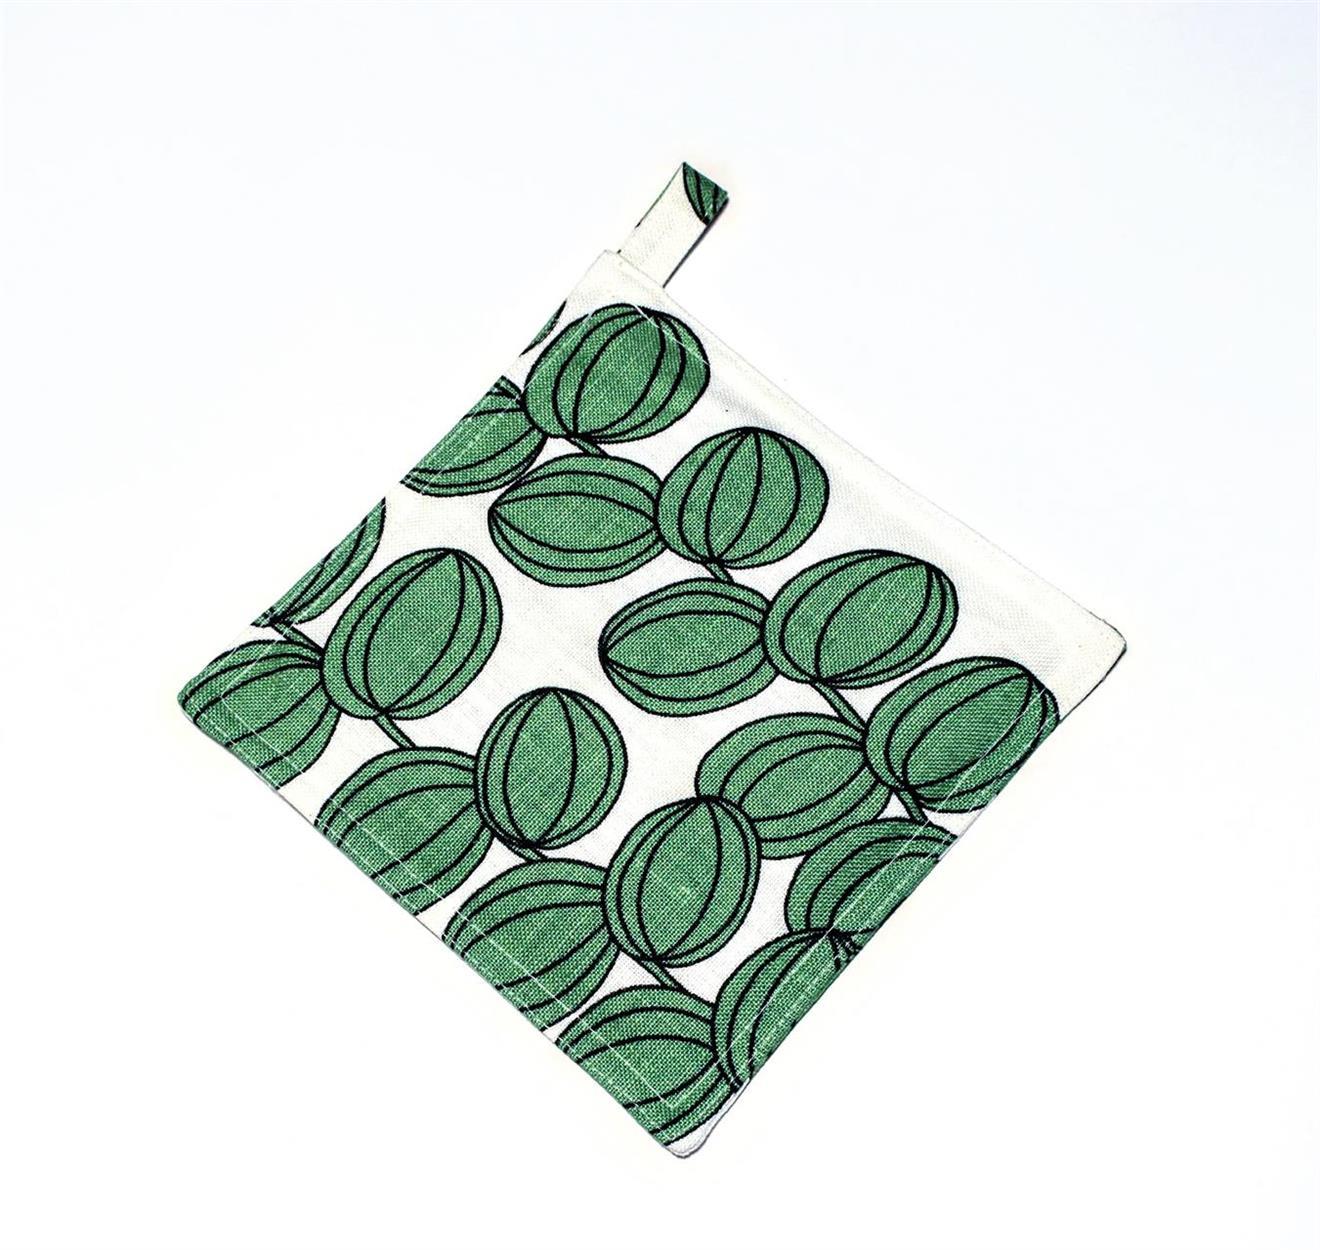 Grytlapp grön Celotocaulis